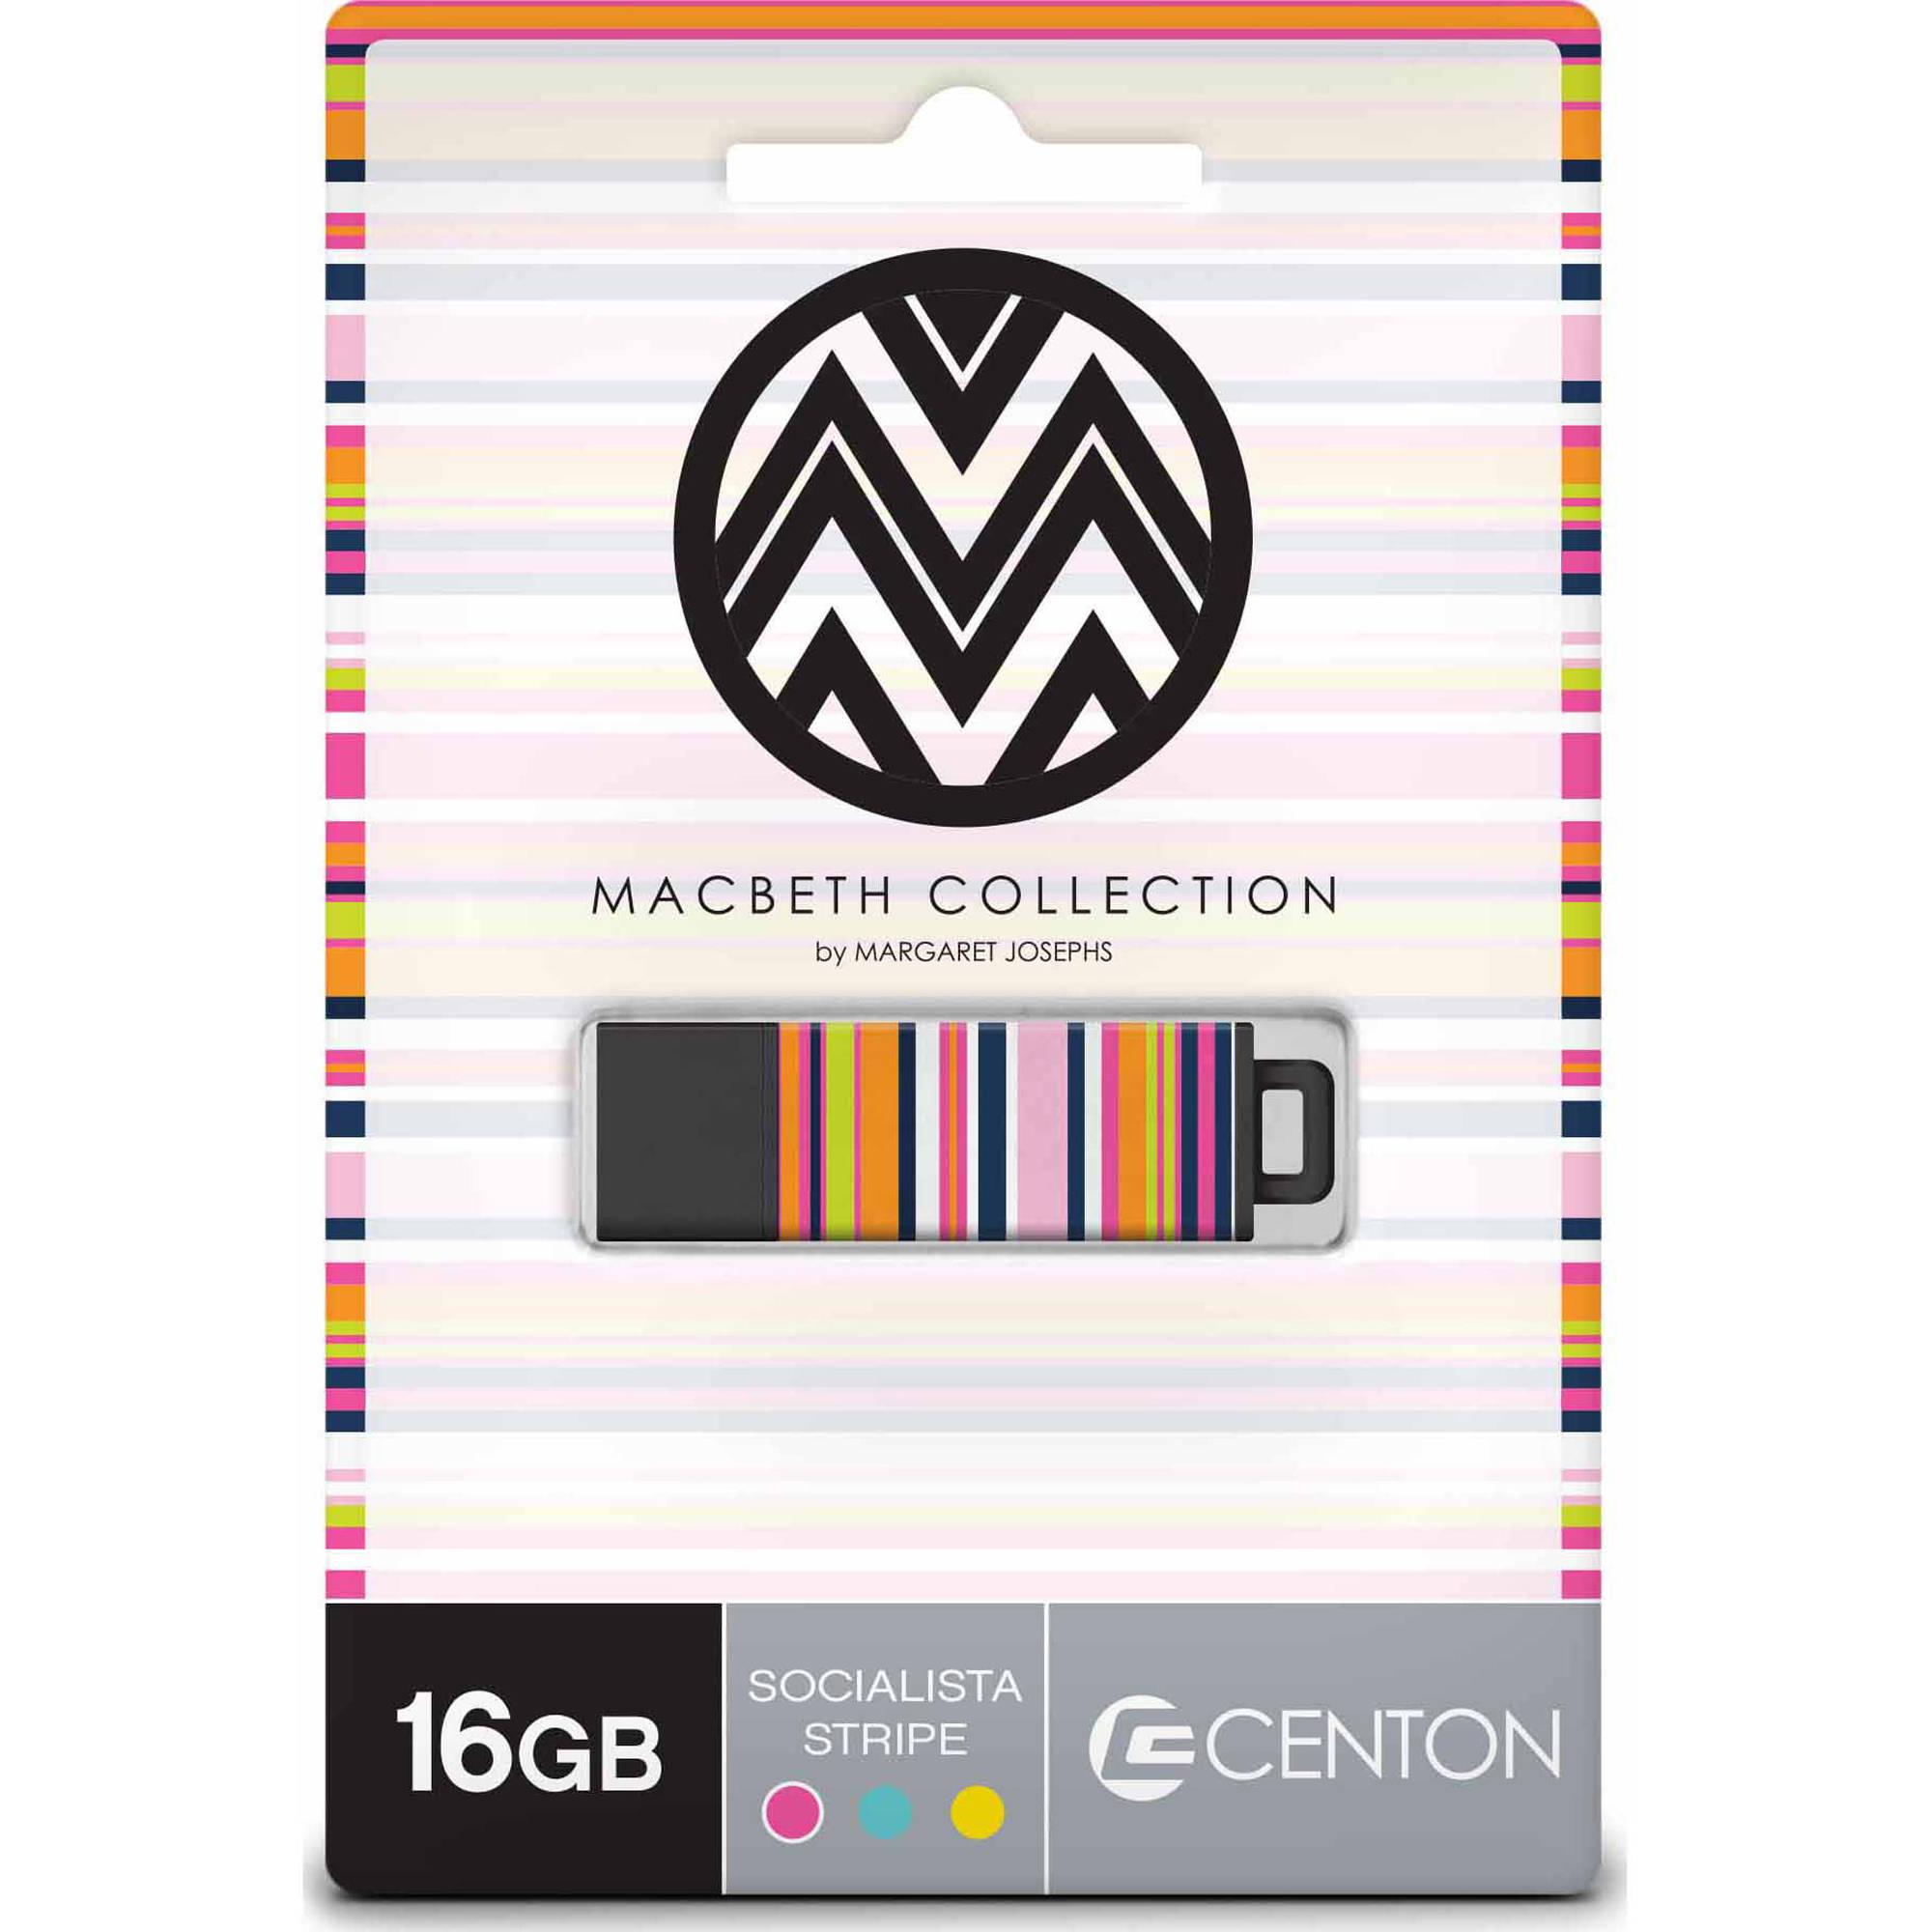 Centon 16GB PRO2 Macbeth USB Flash Drive, Soc Stripe